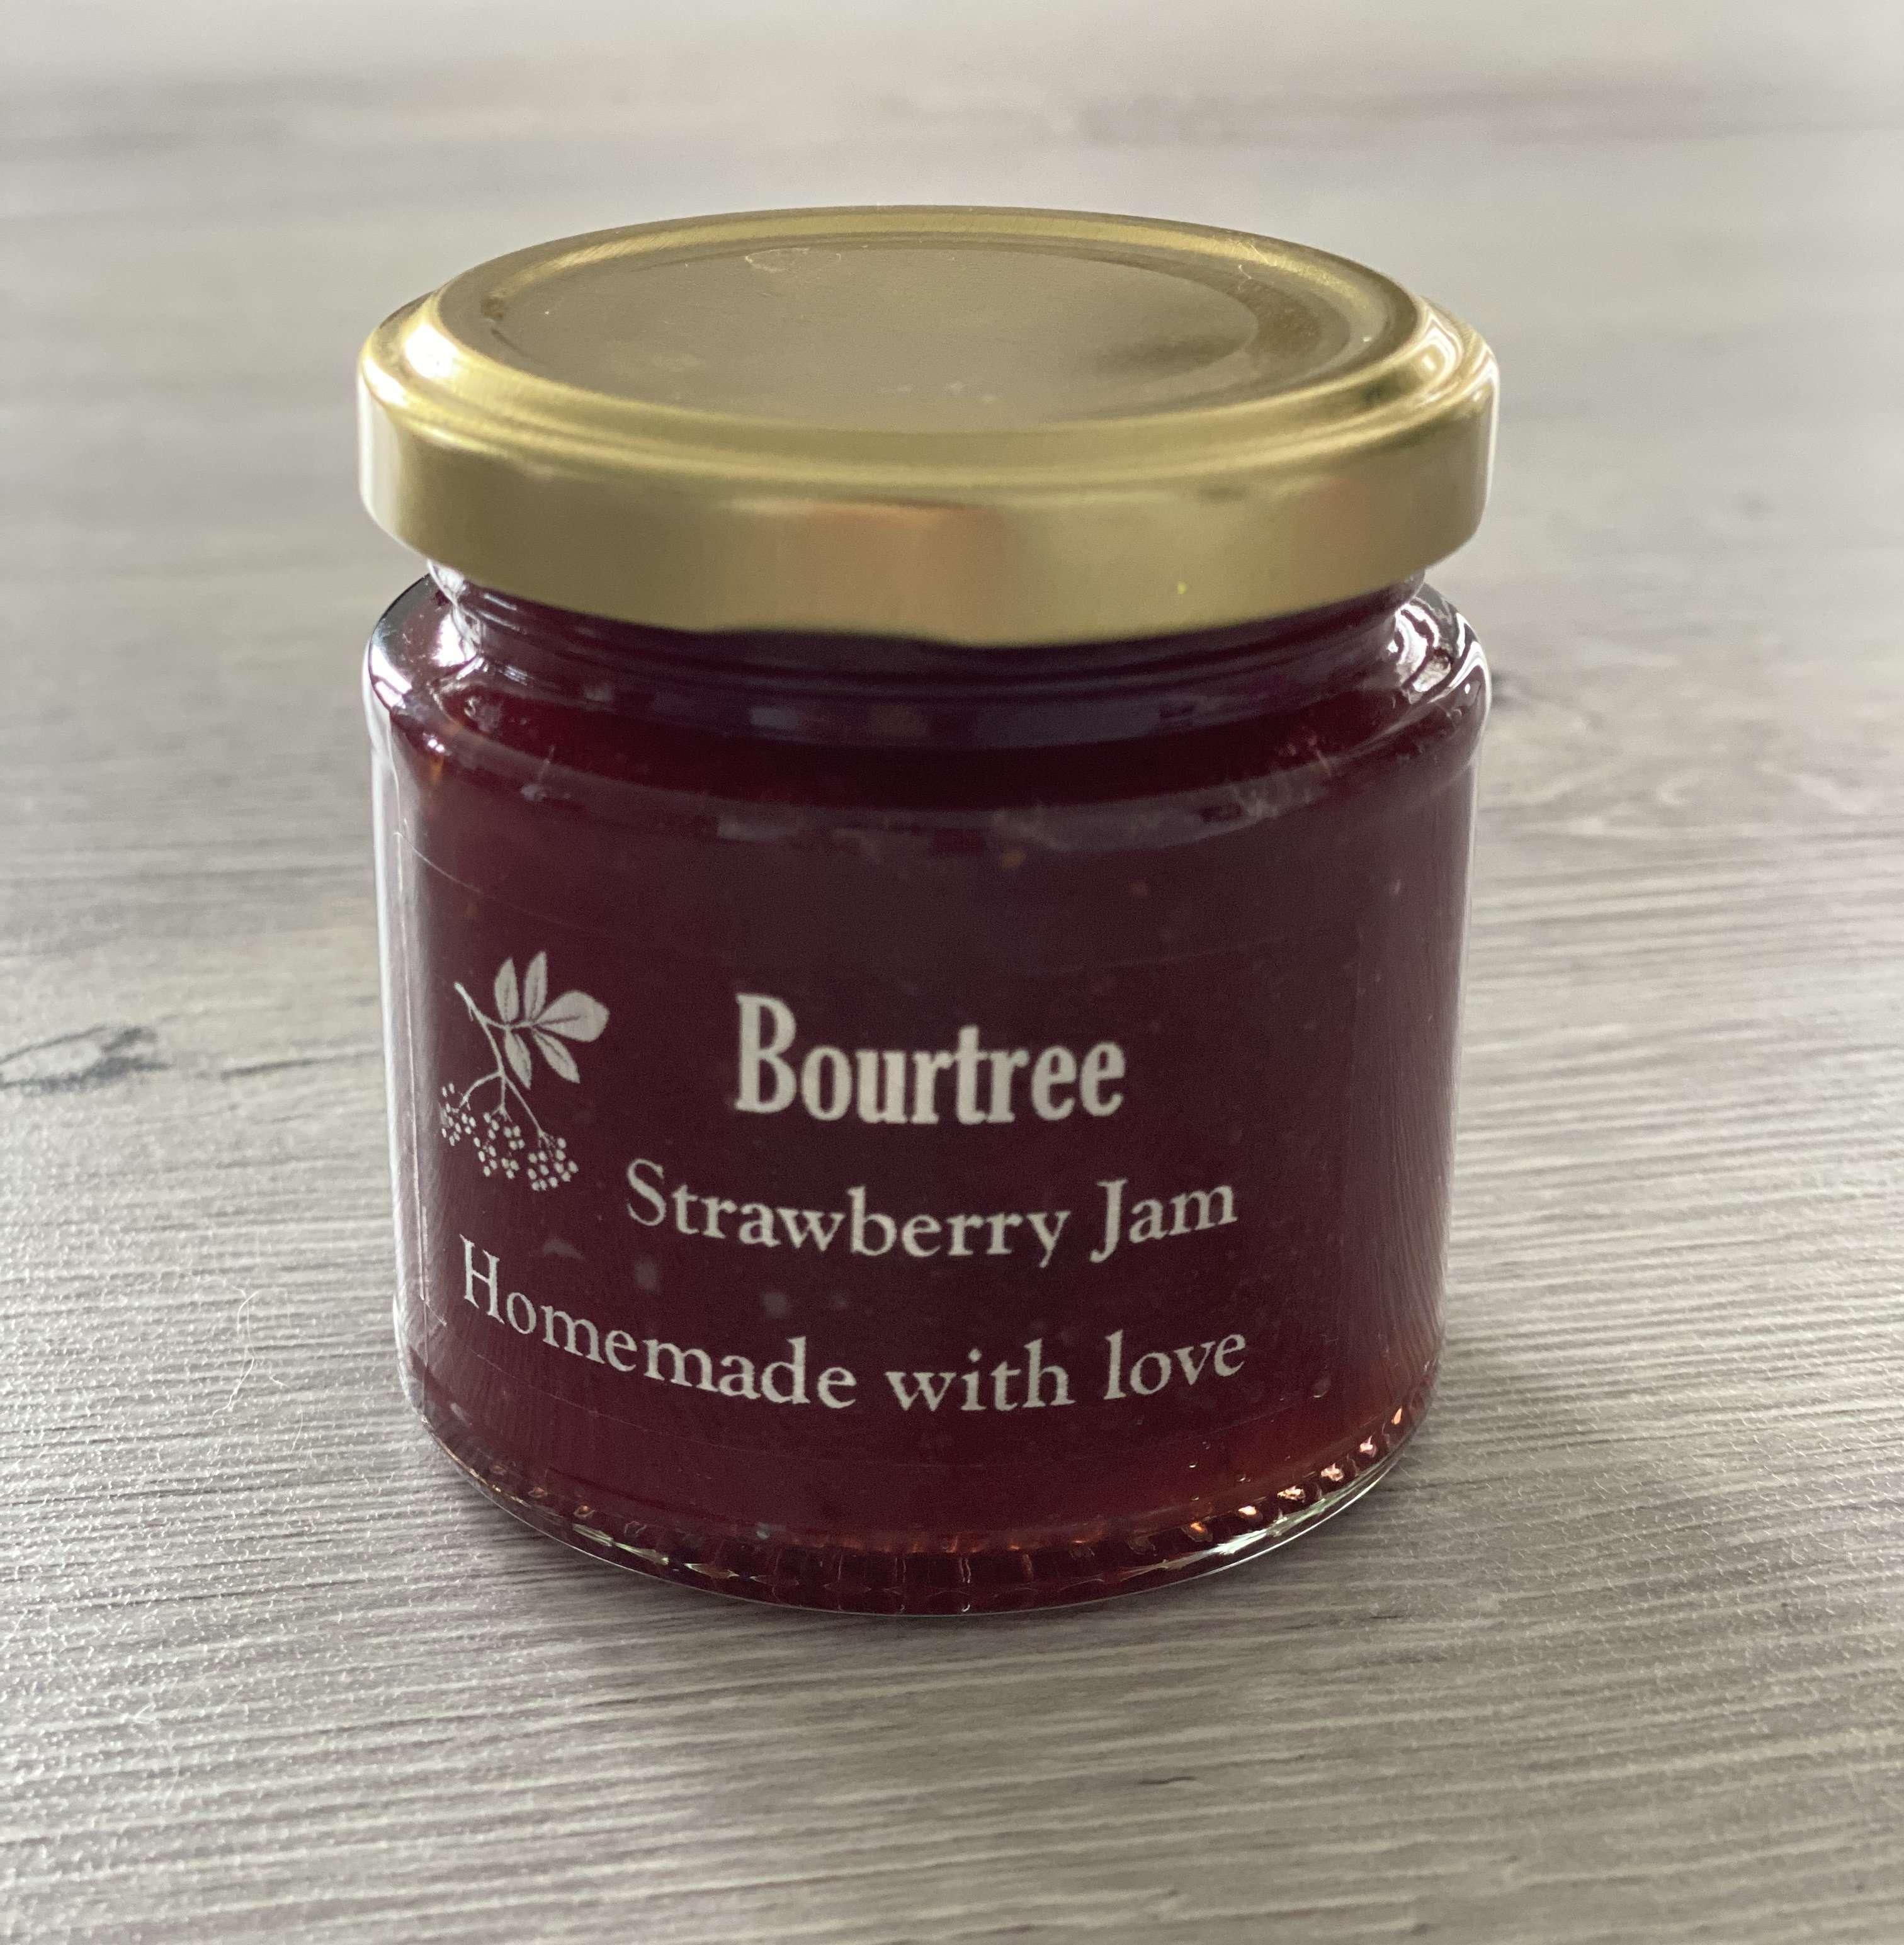 Bourtree Strawberry Jam